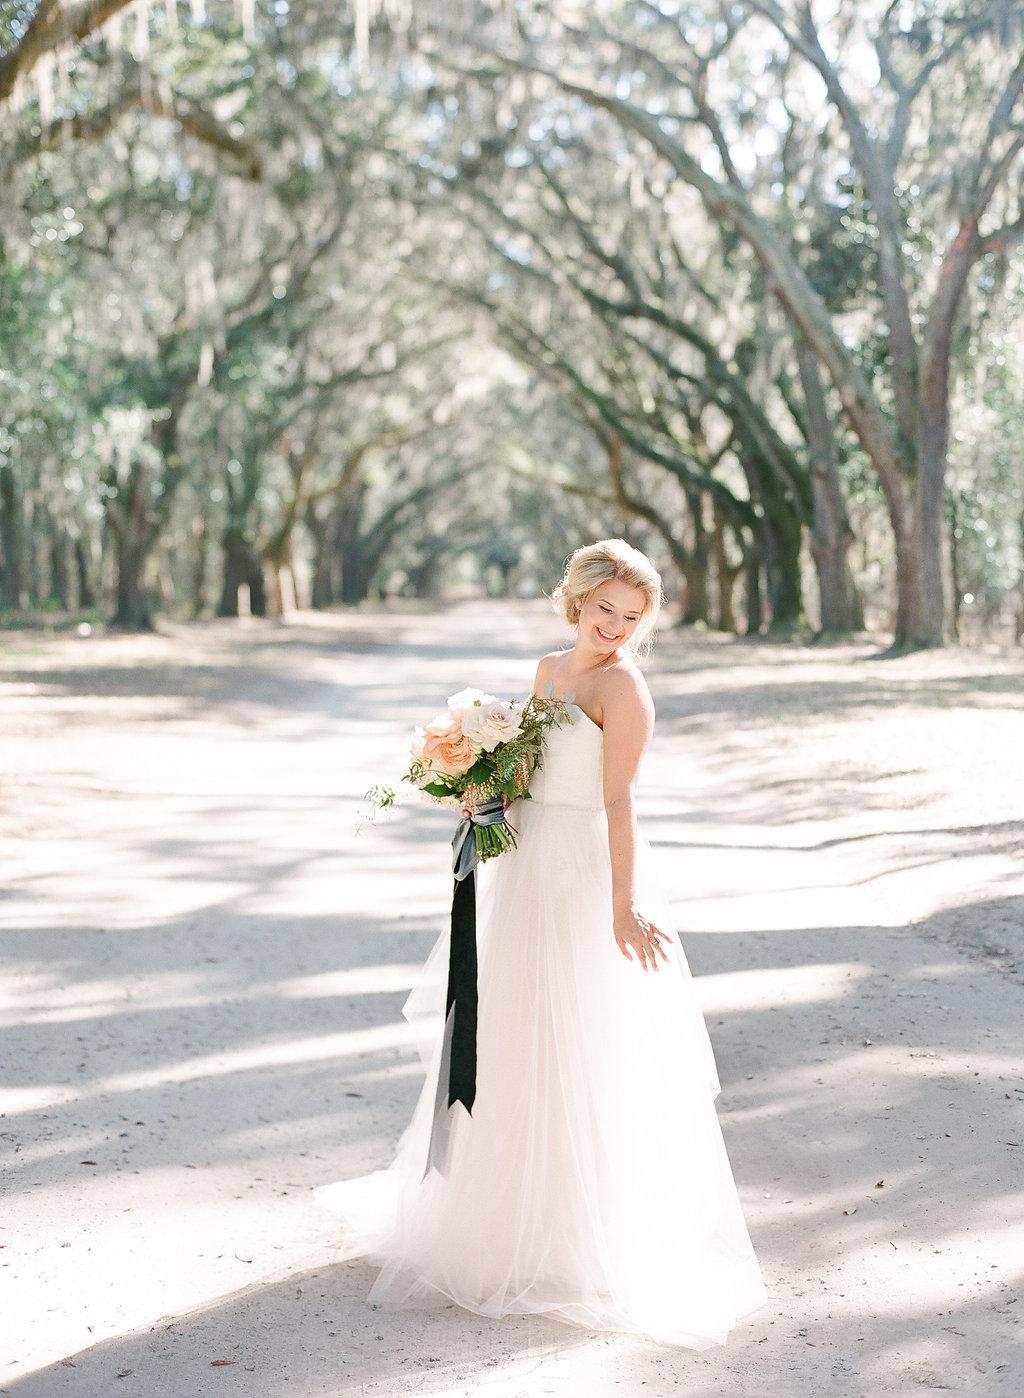 the-happy-bloom-wormsloe-wedding-savannah-wedding-ivory-and-beau-bridal-boutique-savannah-wedding-dresses-savannah-bridal-boutique-georgia-bridal-boutique-design-studio-south-sunset-wedding-blush-by-hayley-paige-candi-1550-blush-wedding-dress-18.jpg